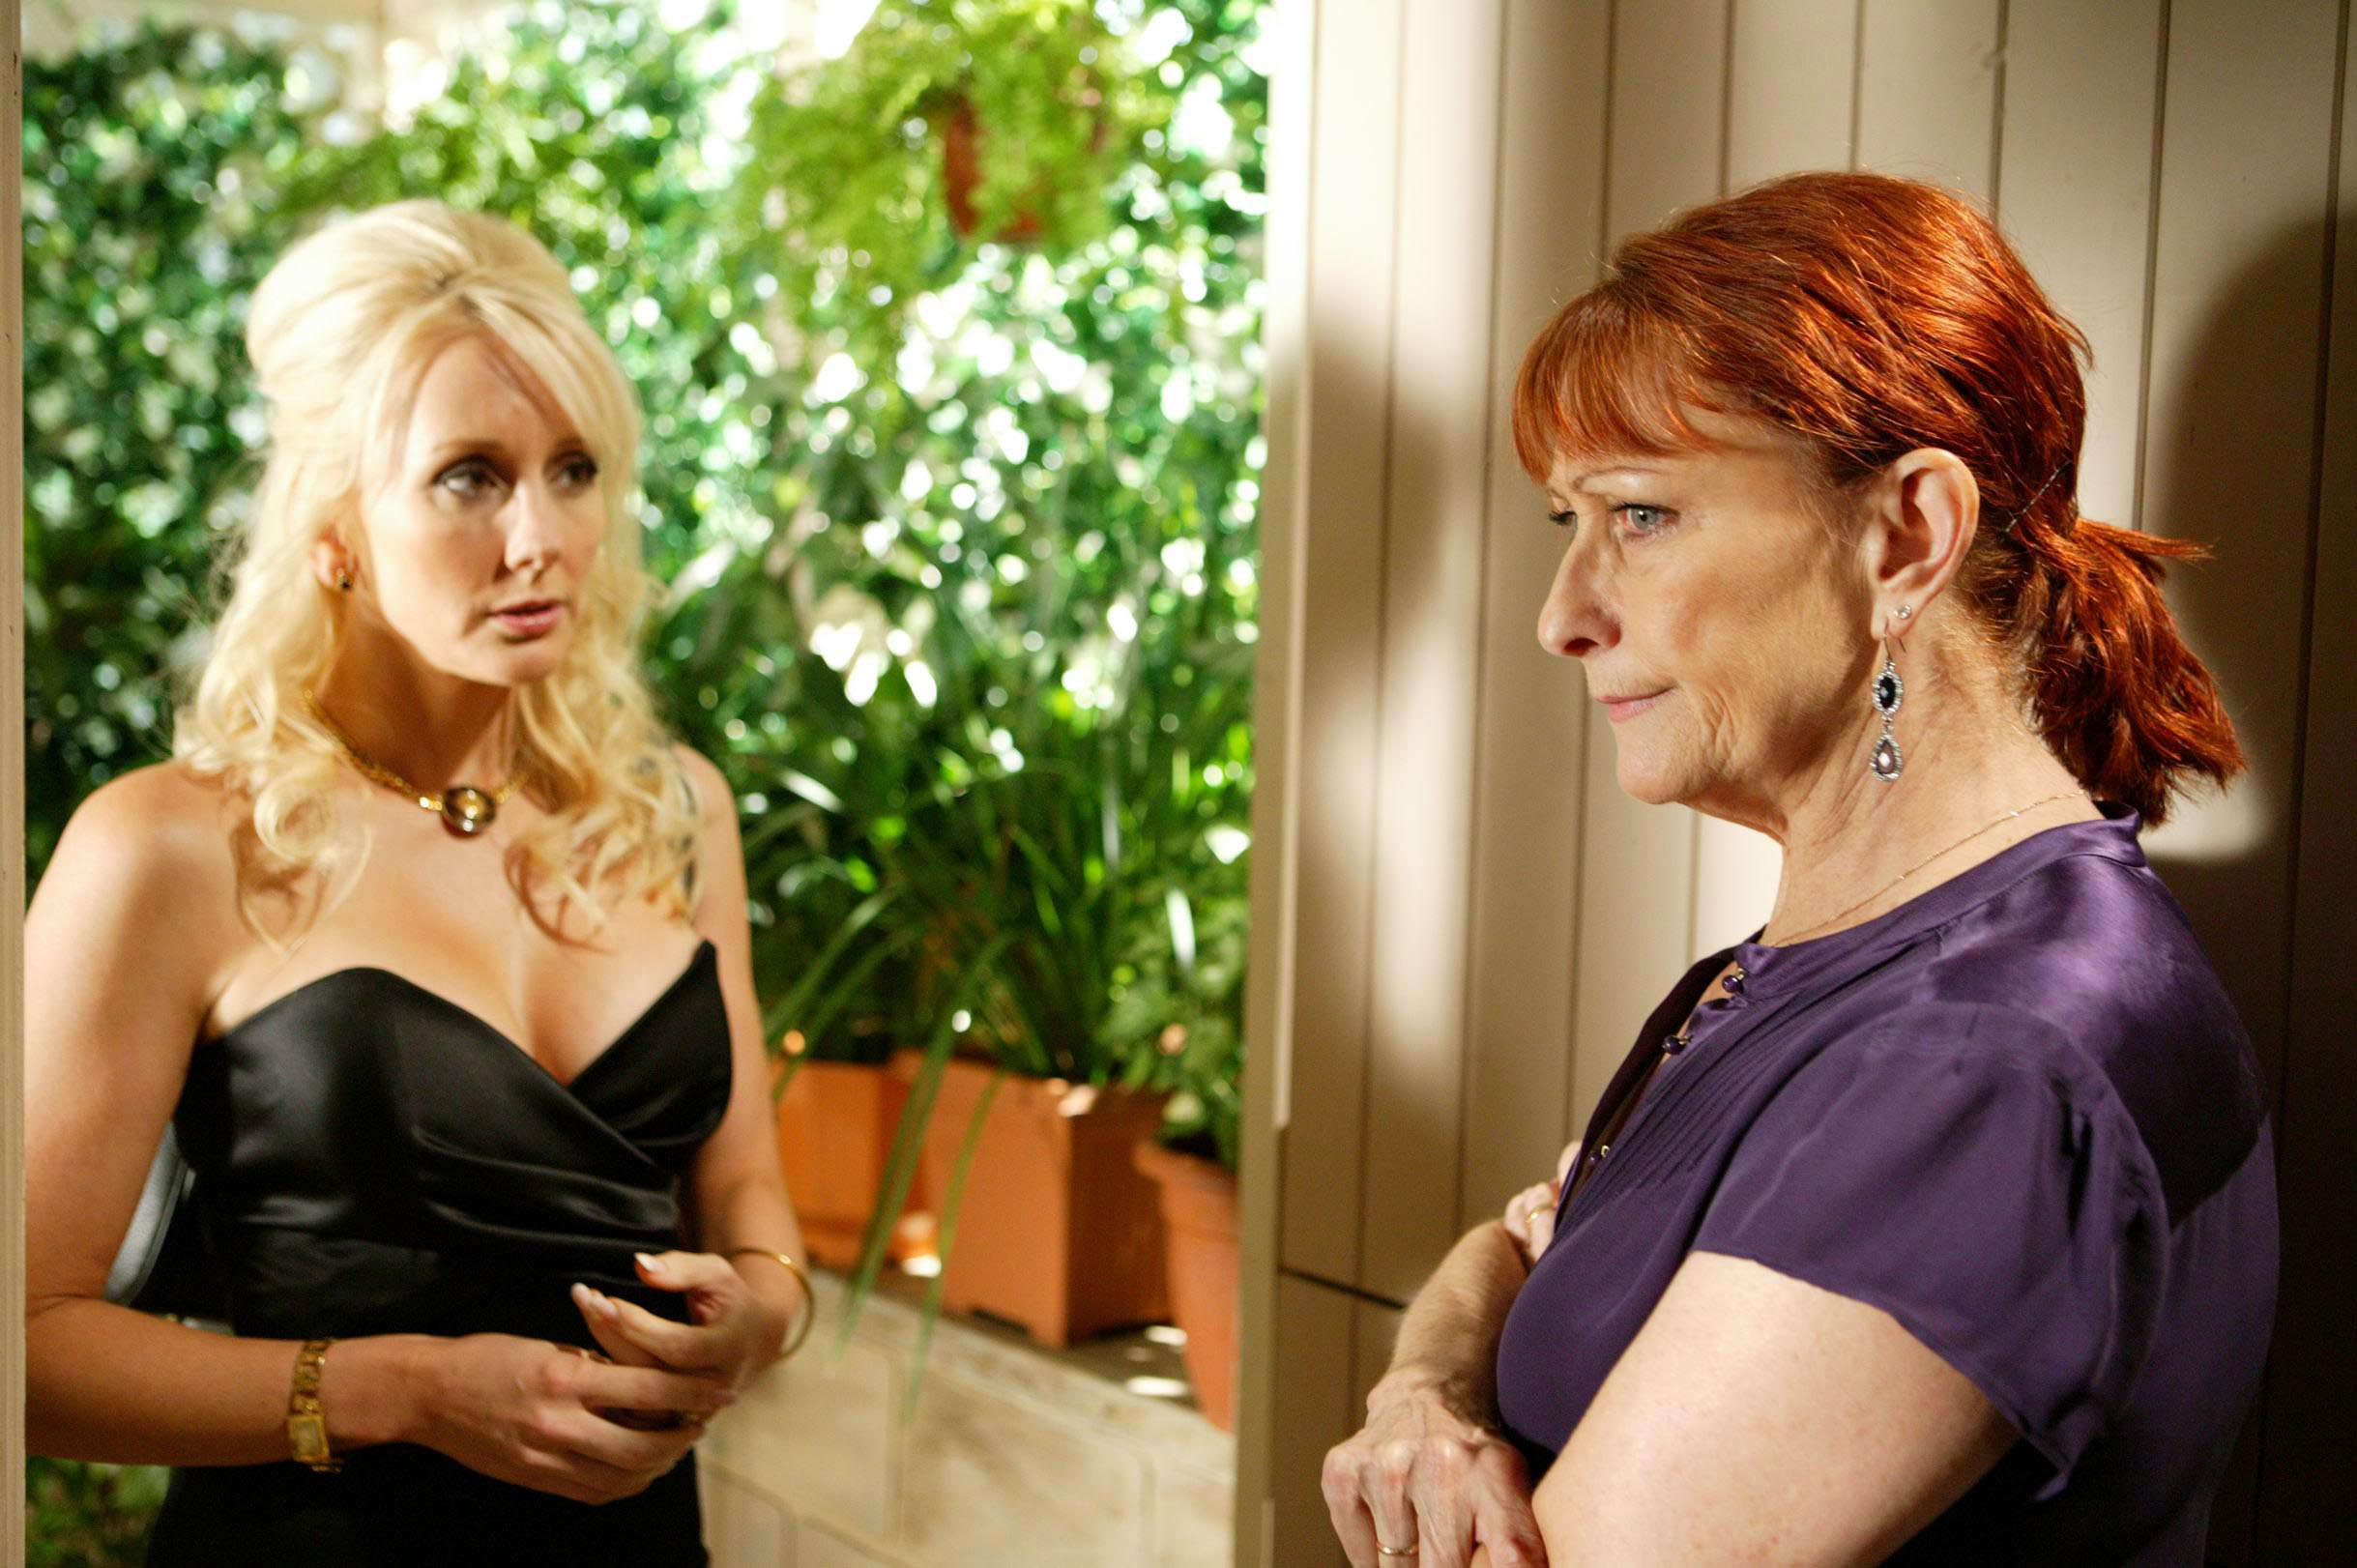 Donna tricks Irene